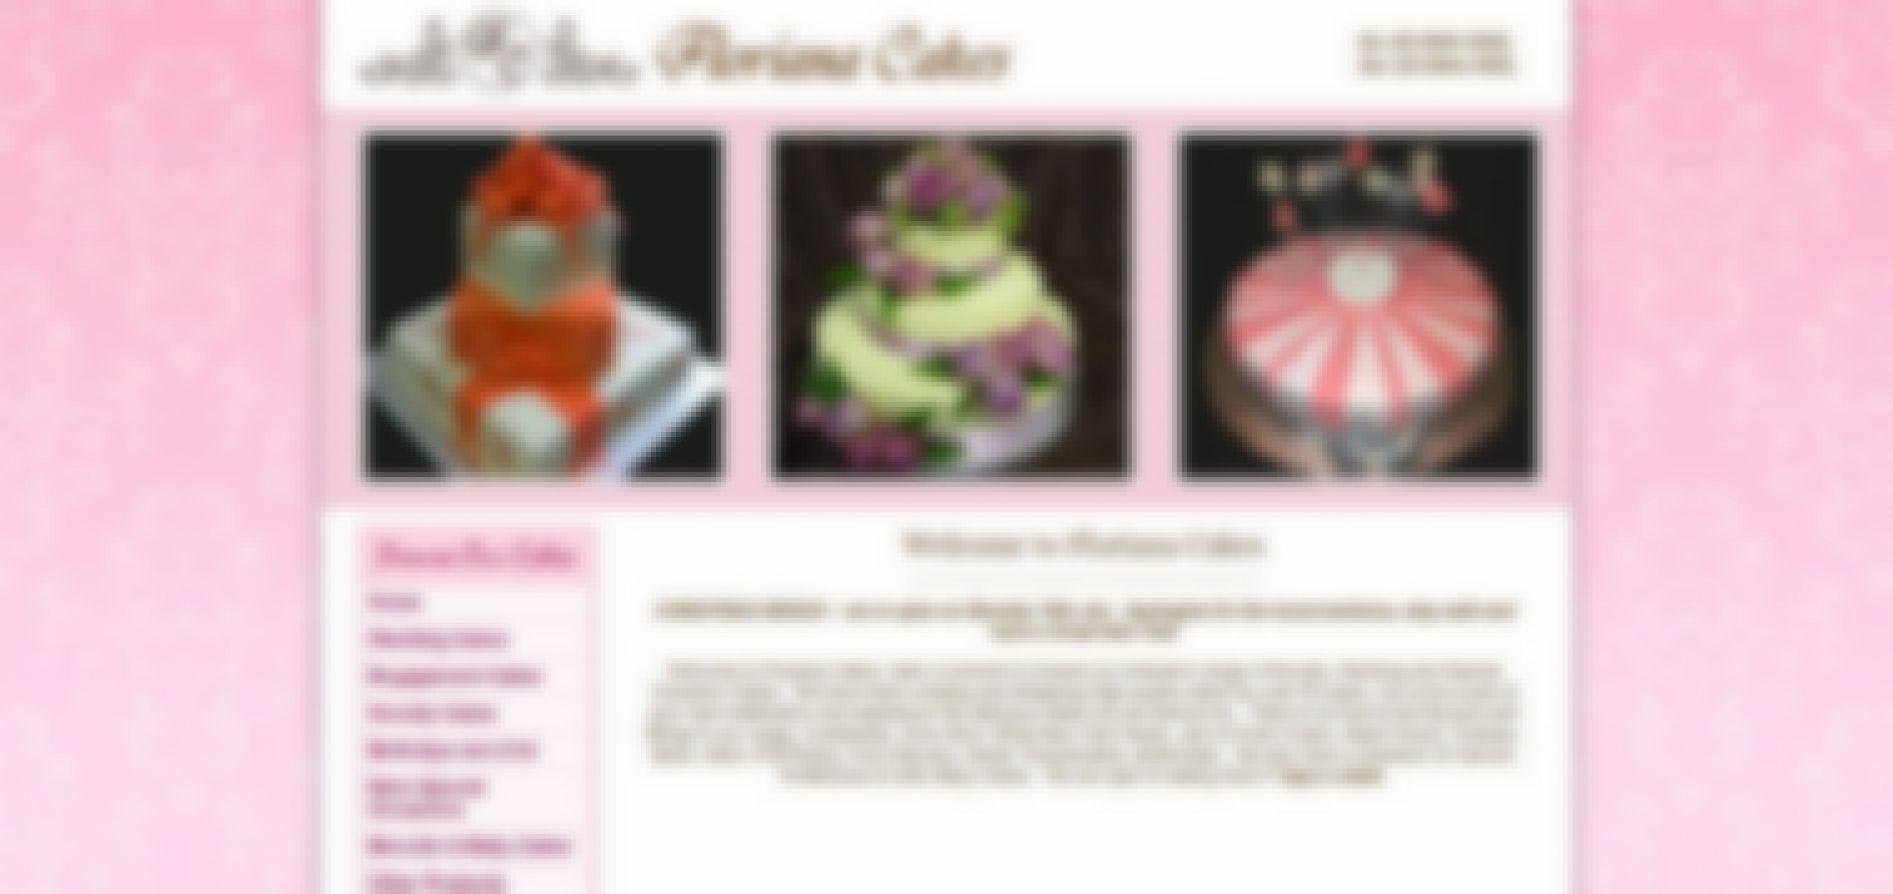 floriana cakes